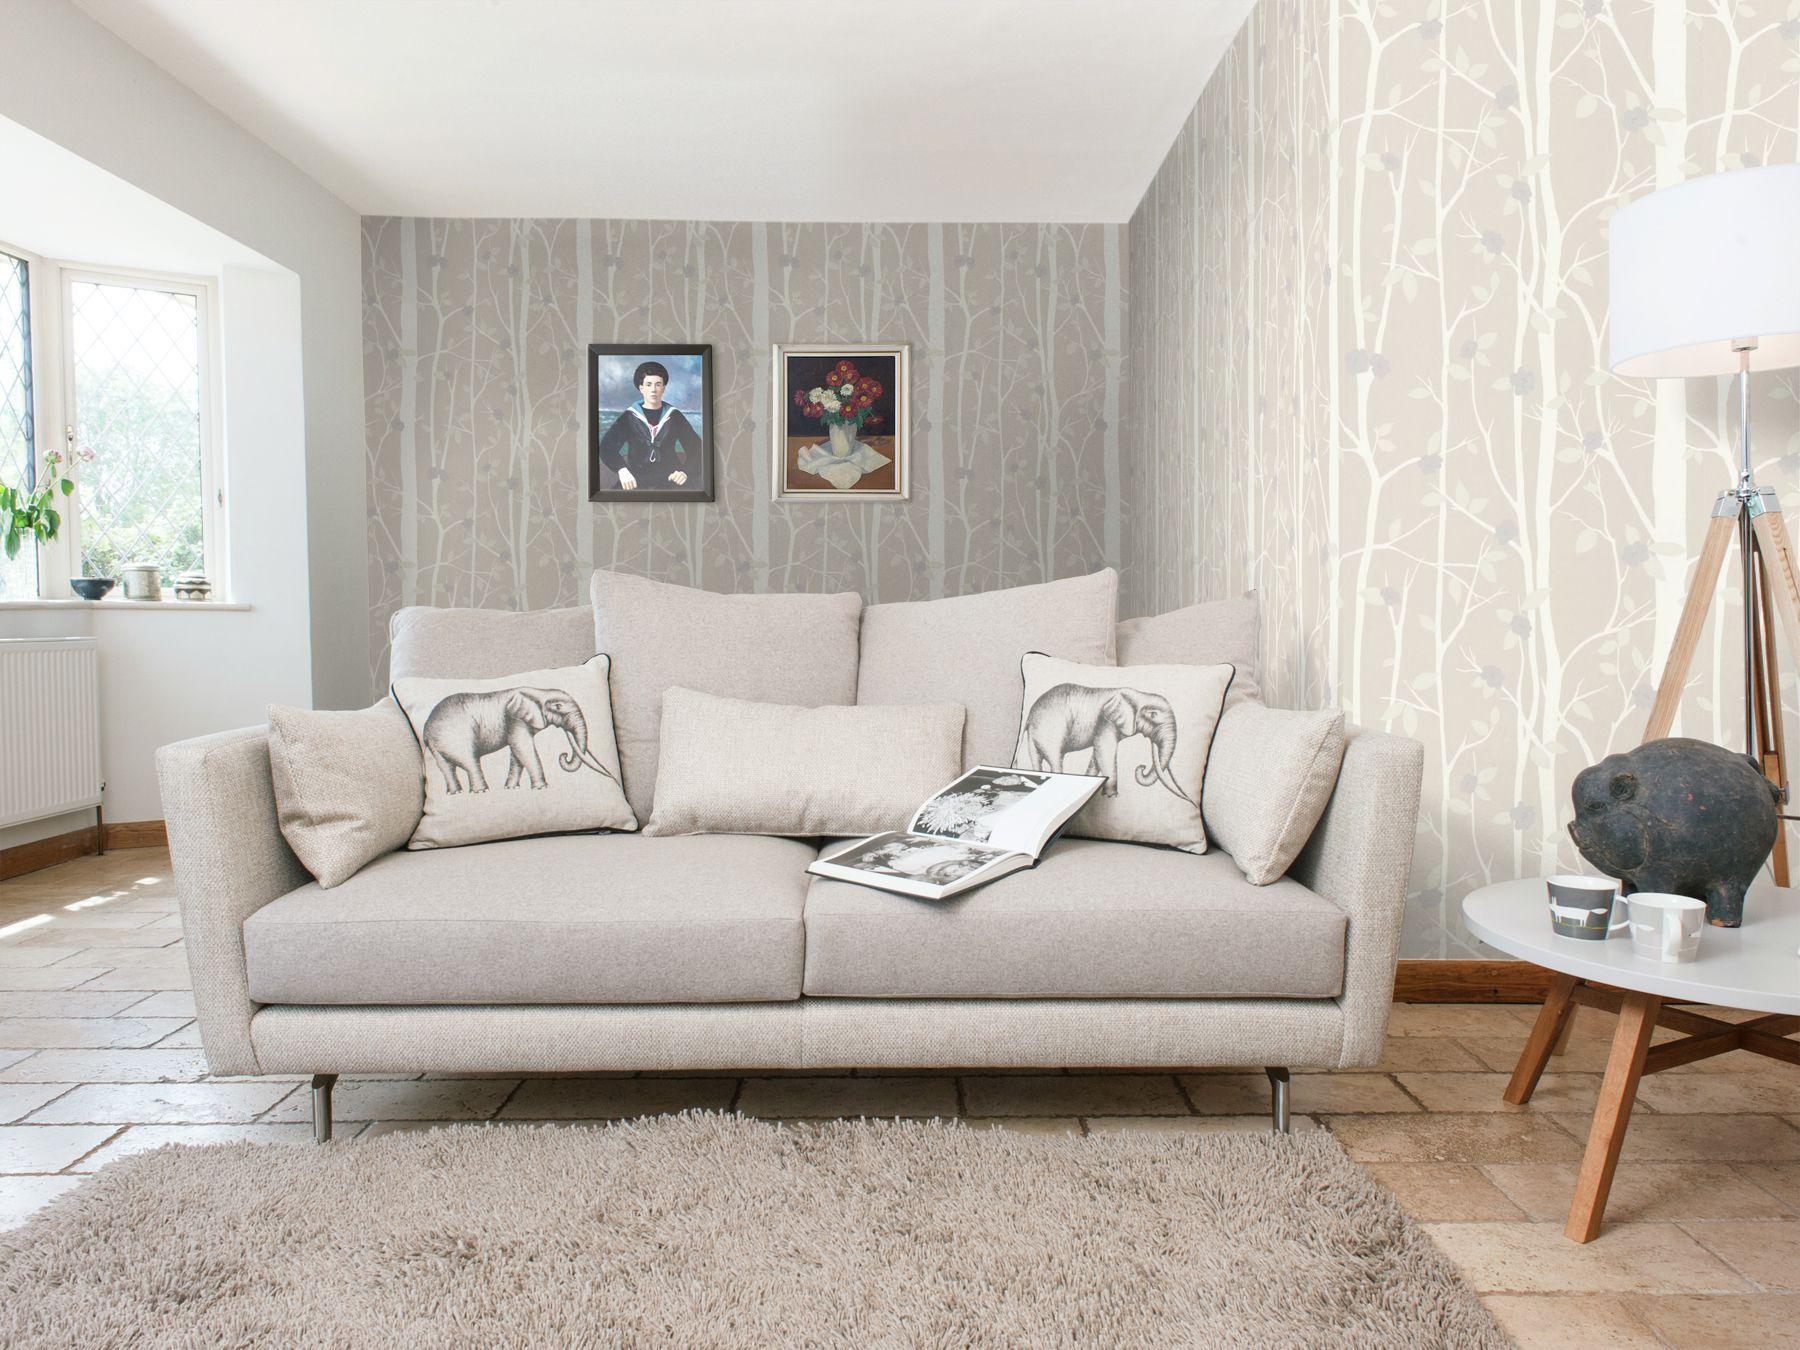 Living Room Ideas Laura Ashley cottonwood roomset image | living room | pinterest | laura ashley